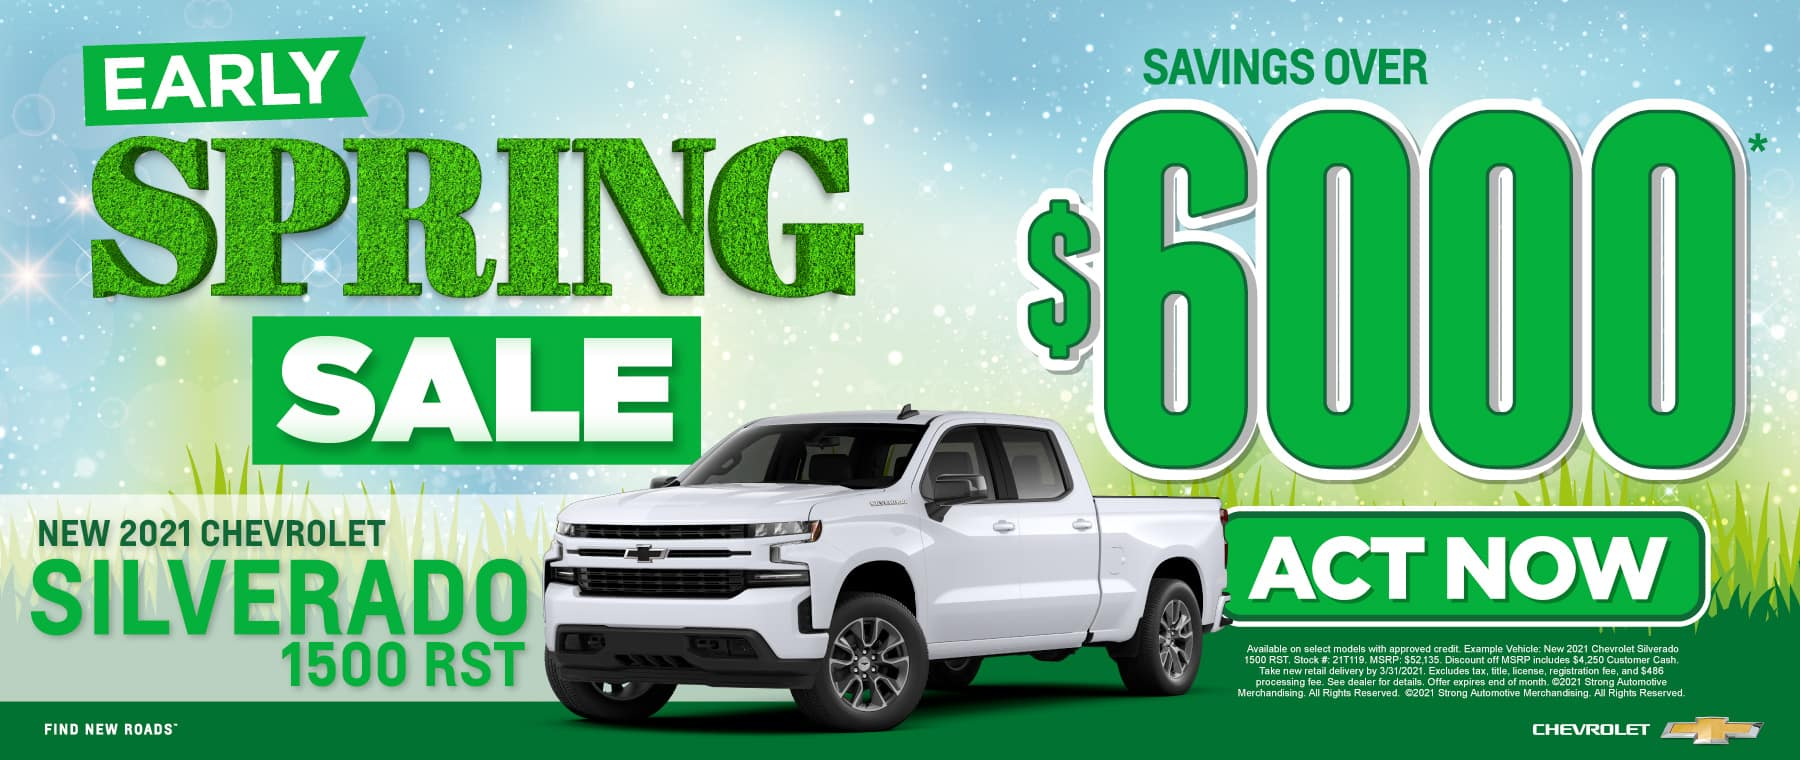 New 2021 Chevy Silverado - Savings of $6000 - Act Now